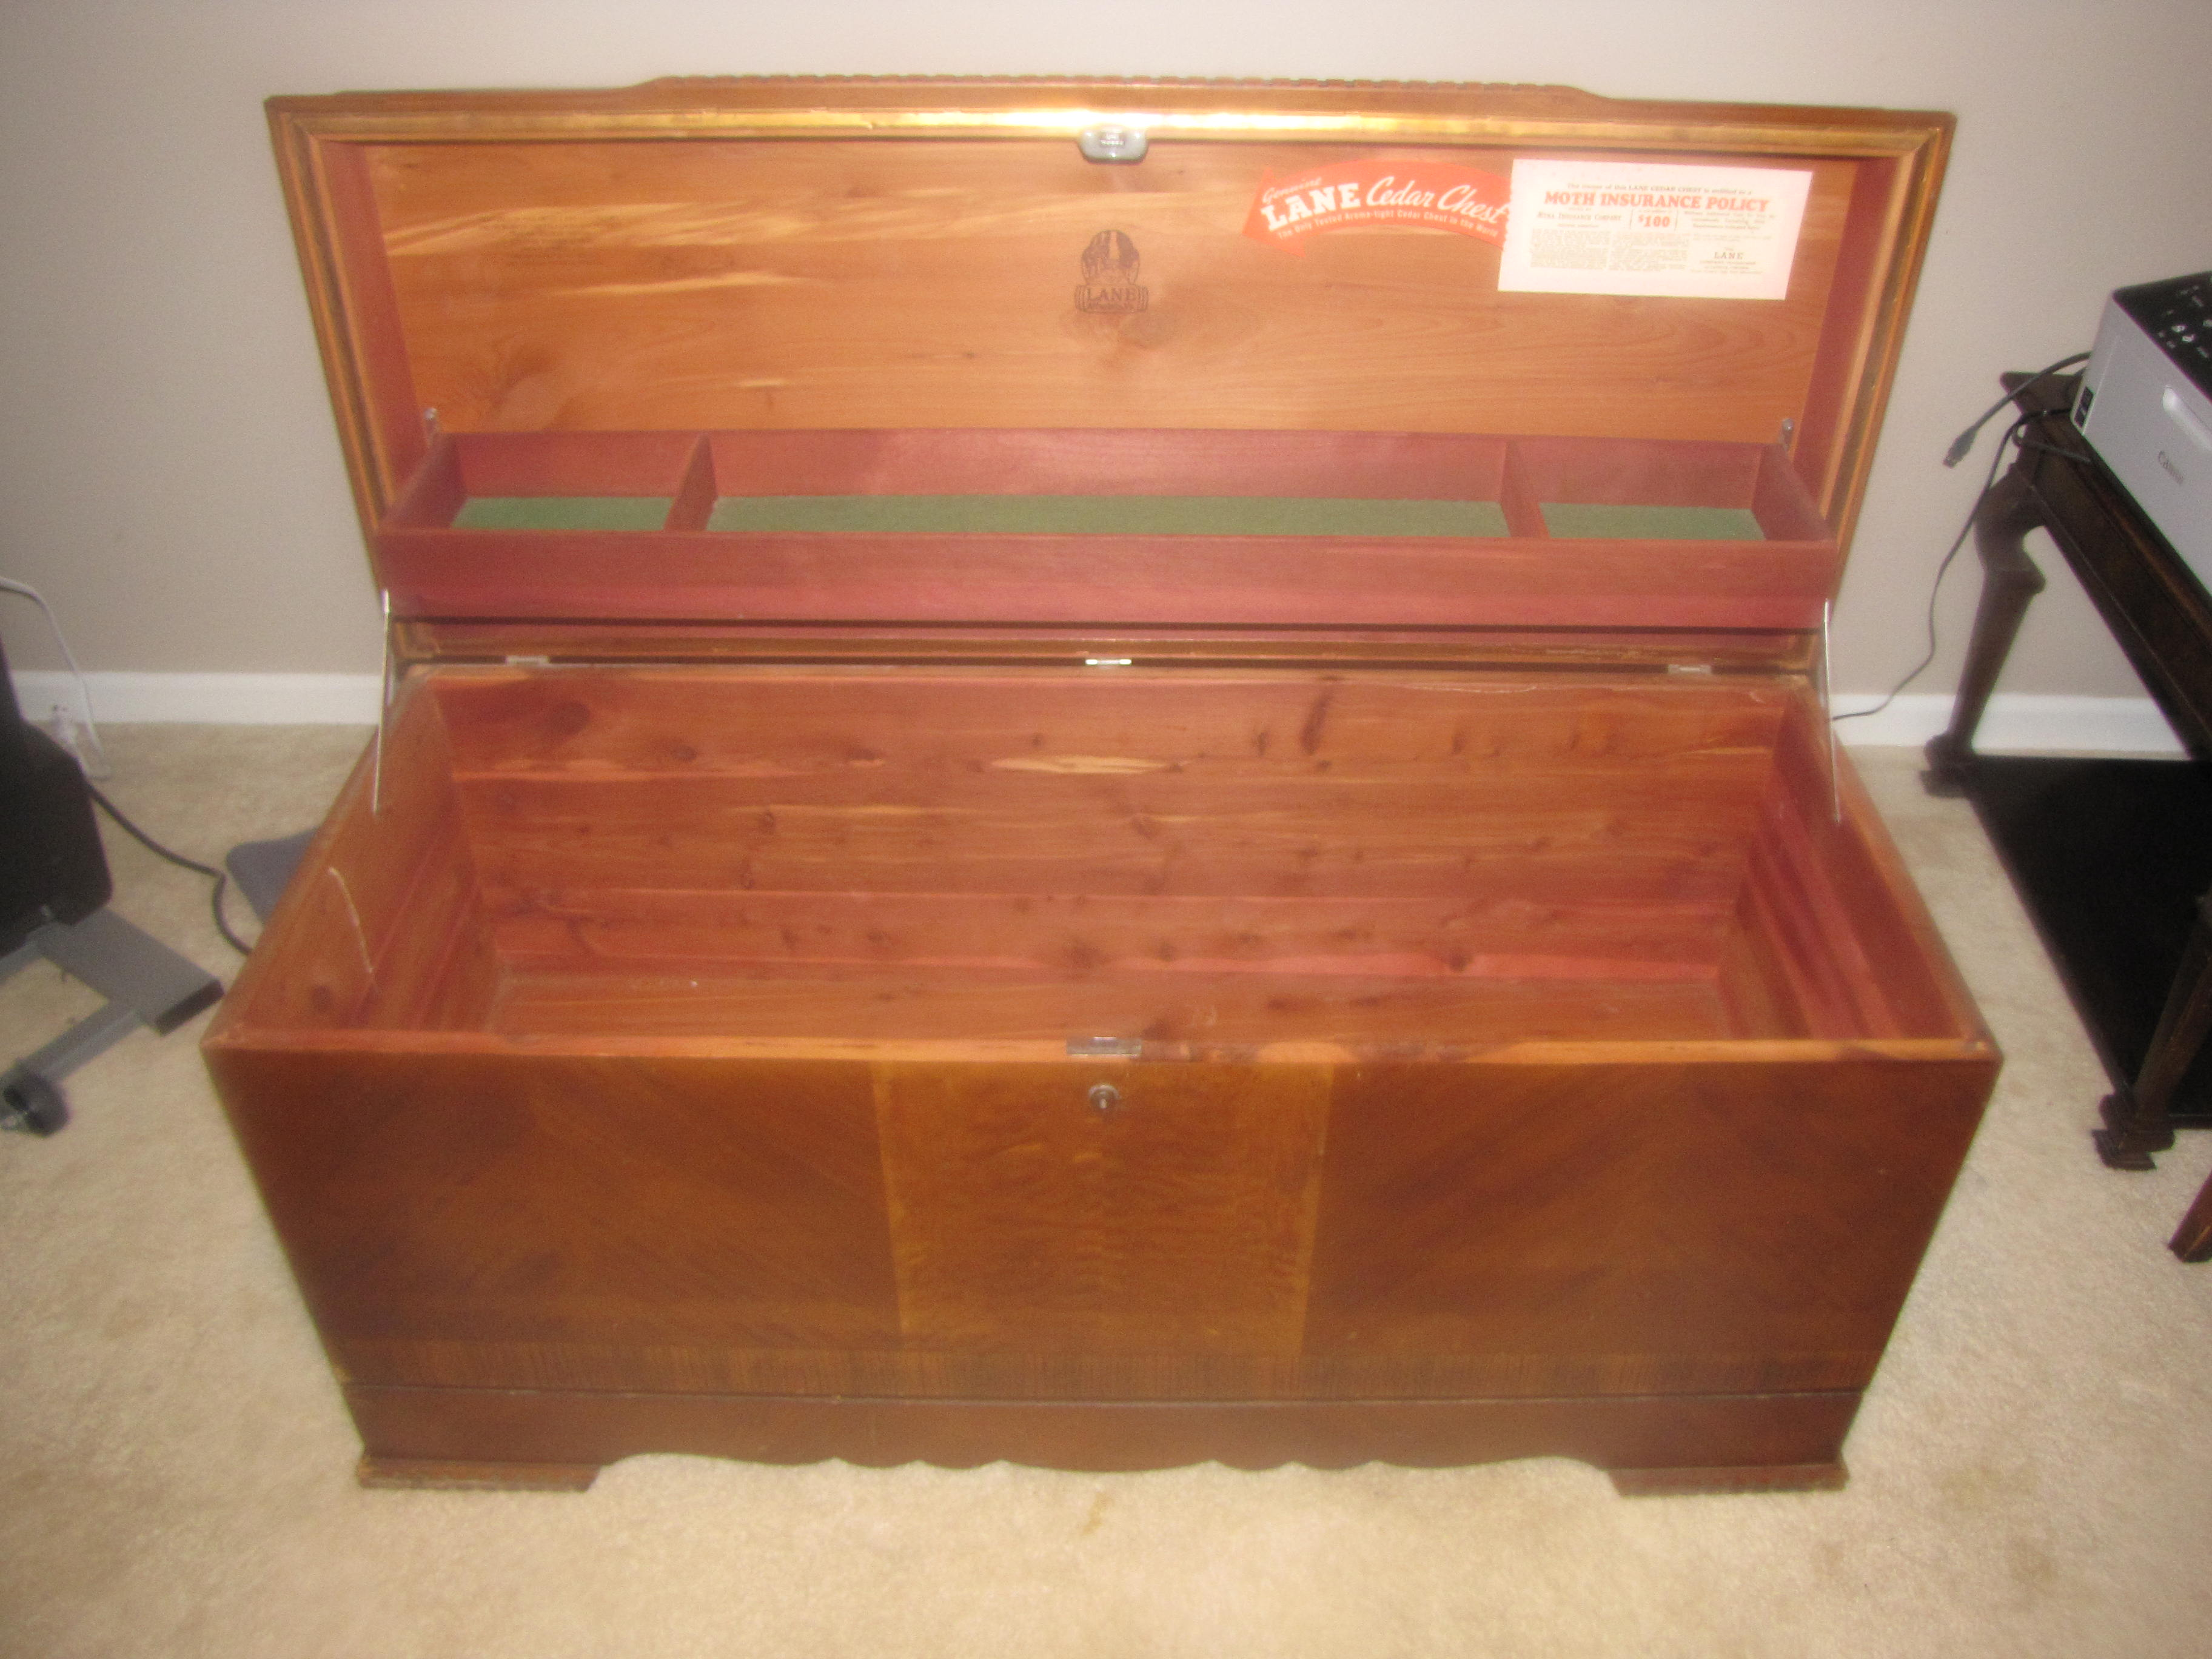 Very Lane Cedar Hope Chest antique appraisal | InstAppraisal SZ32